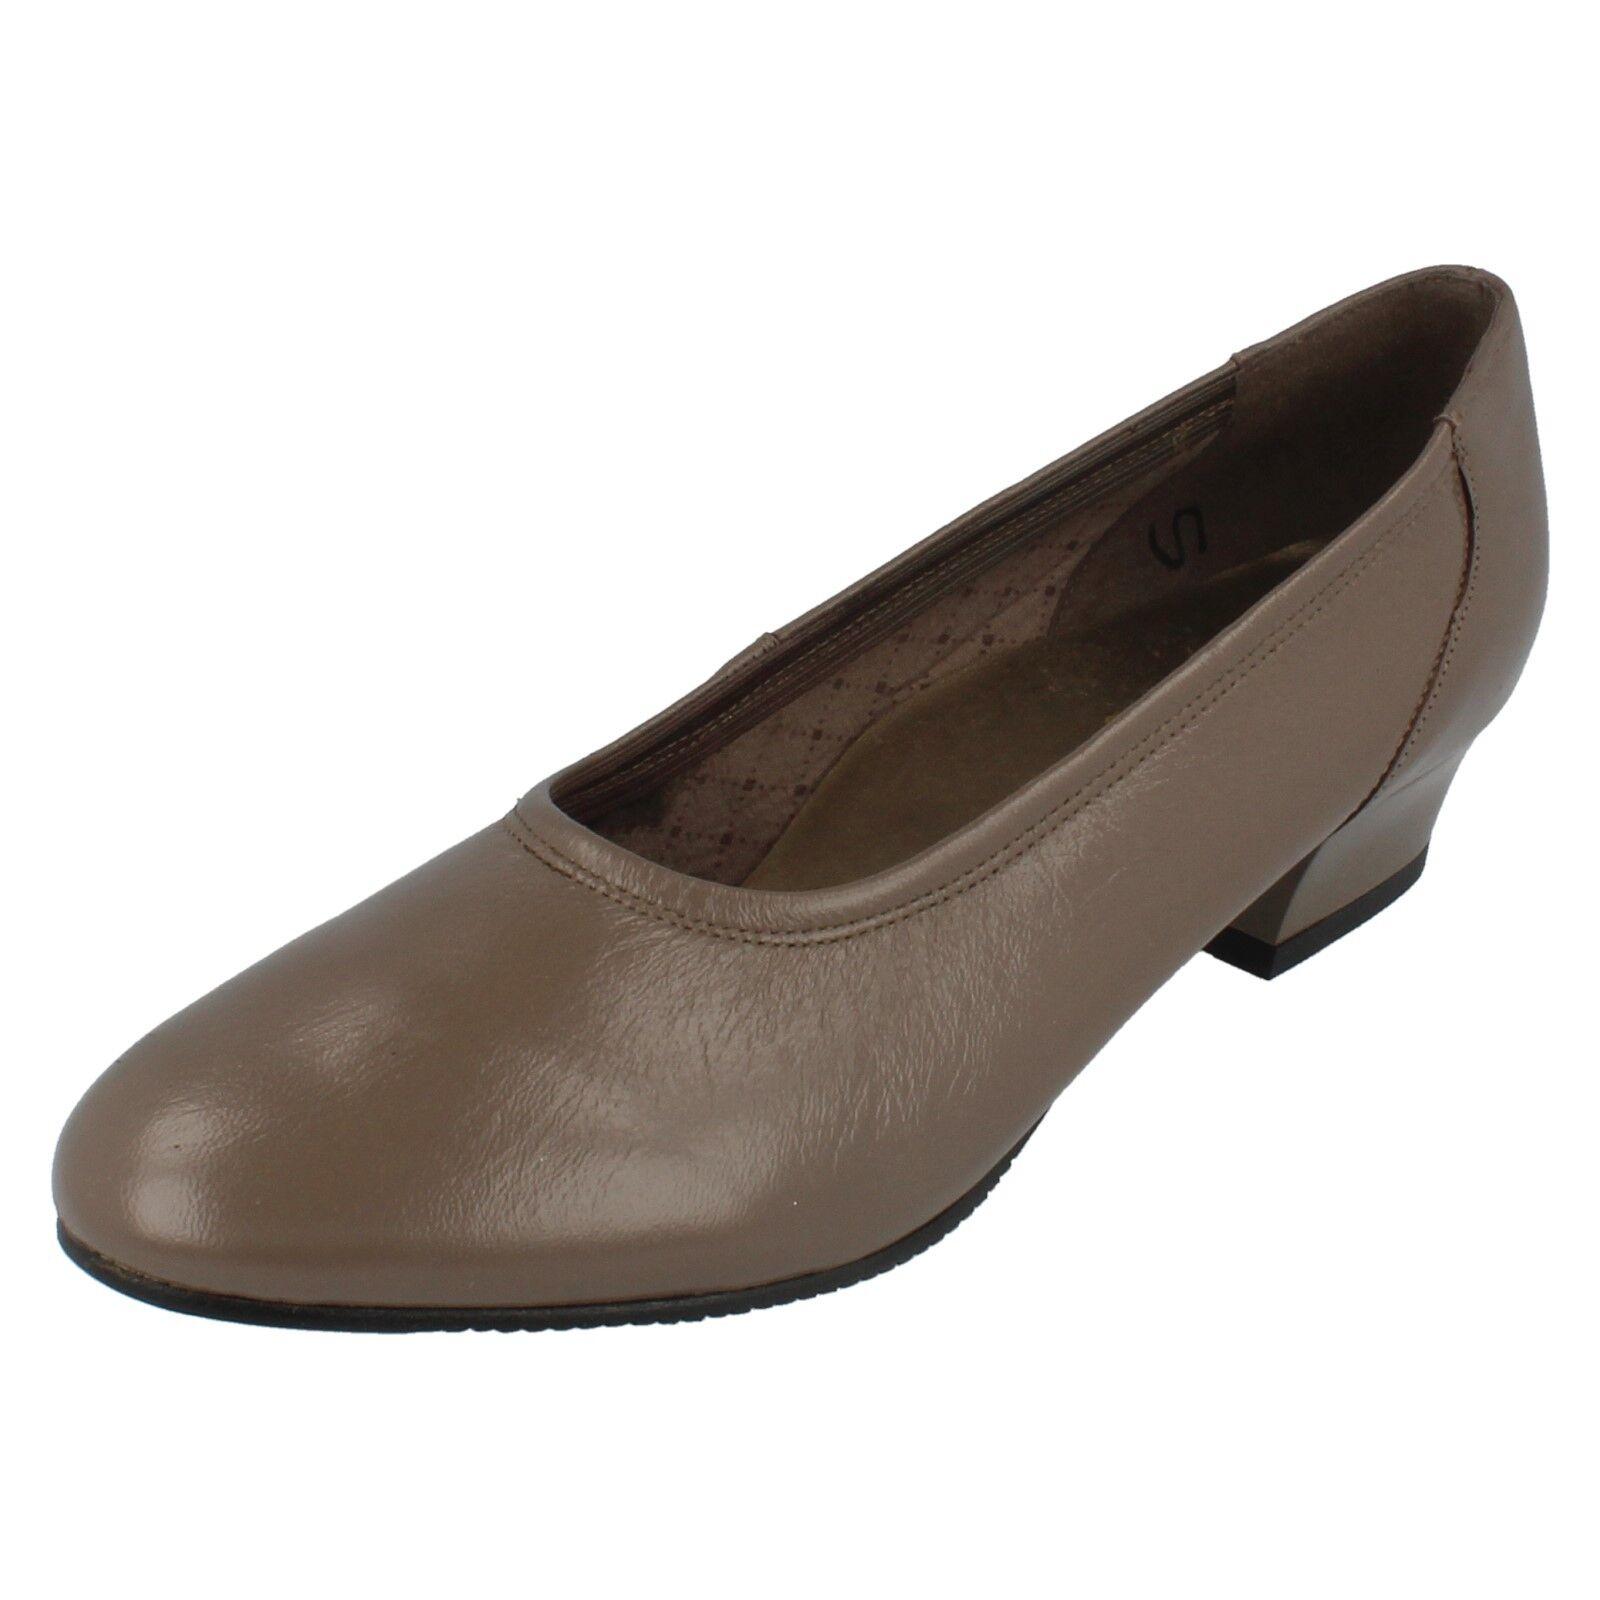 Ladies DEBORAH Dark taupe leather court shoe UK 6.5 BY EQuity  £9.99